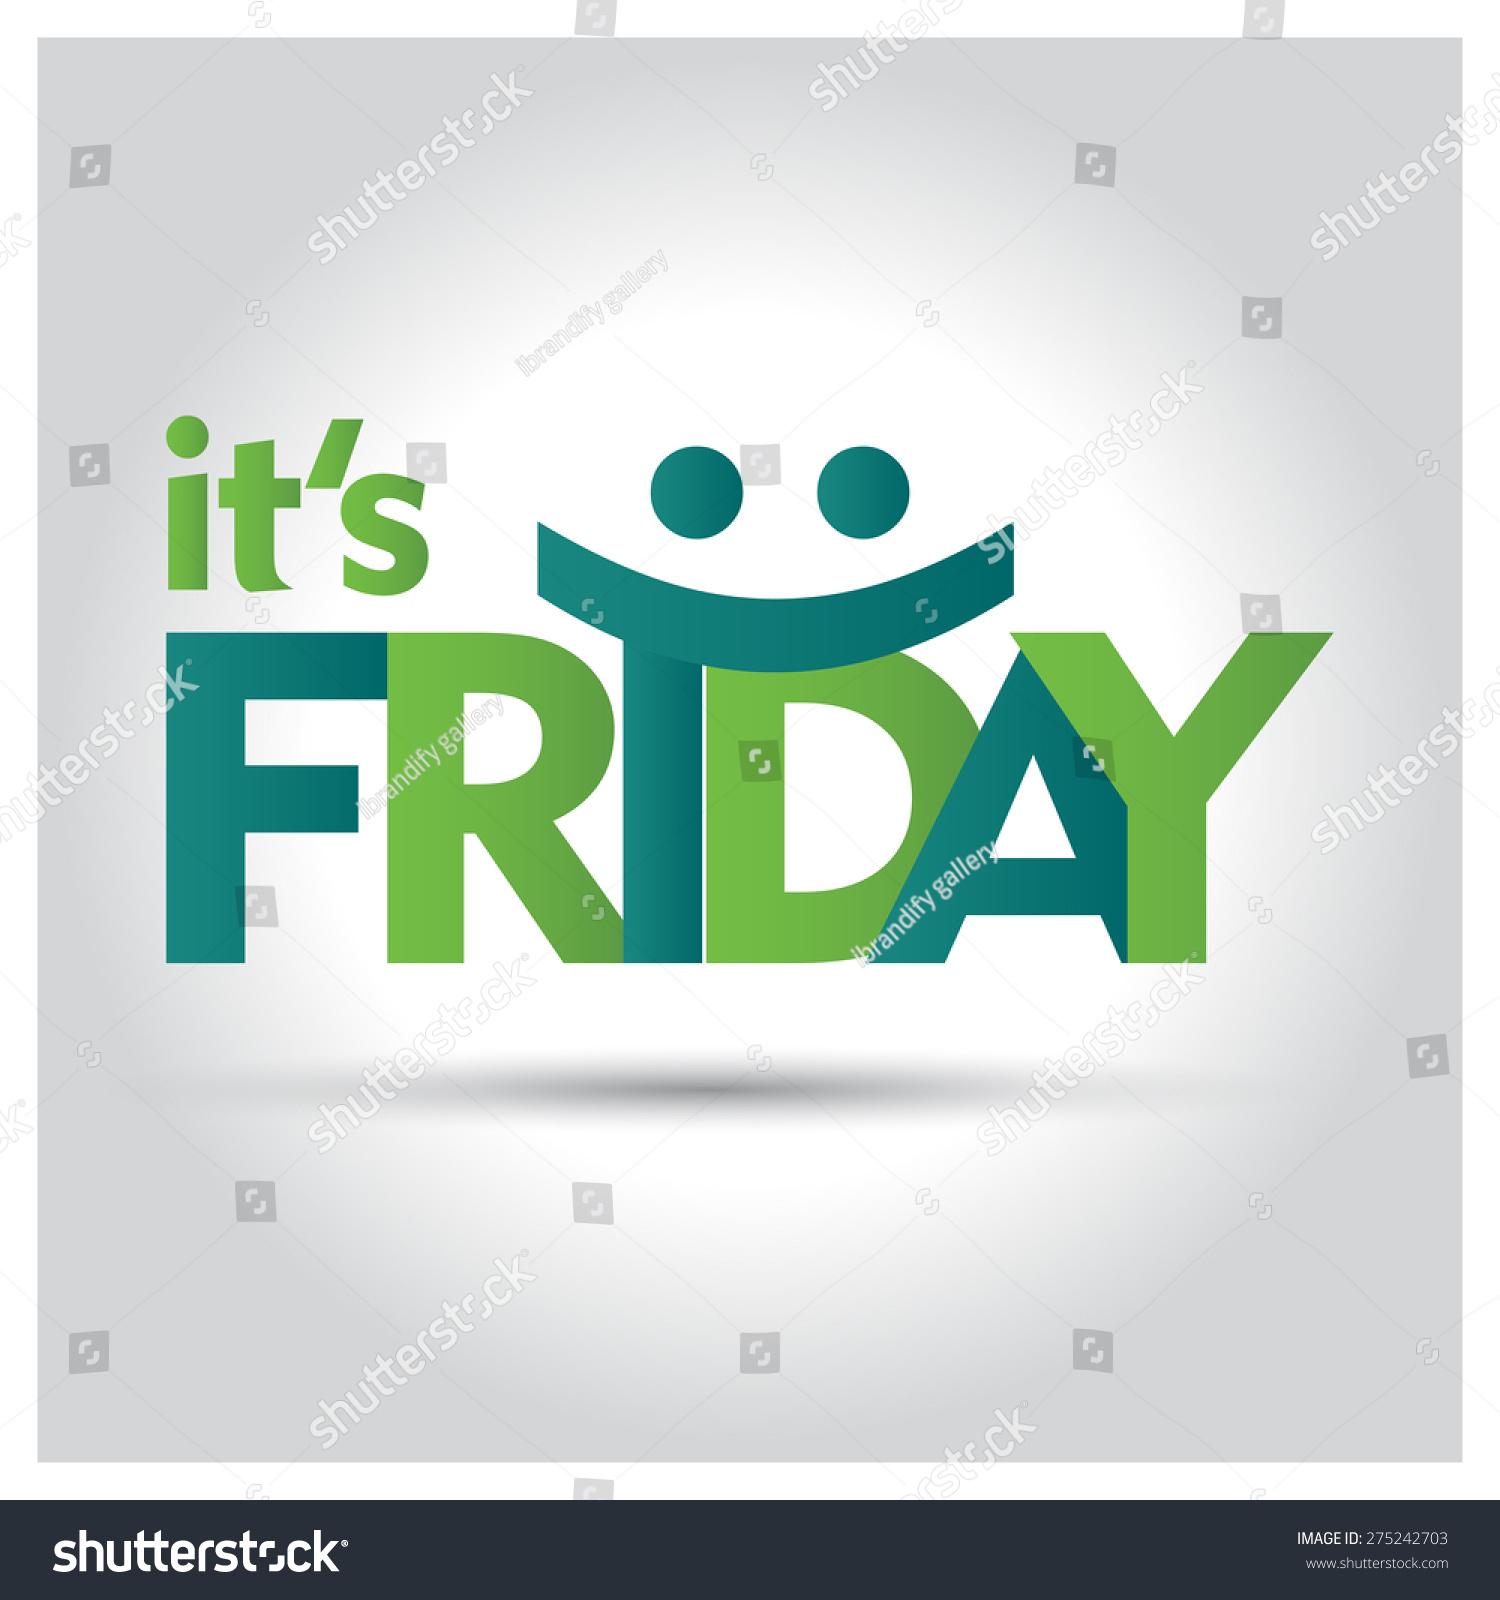 Friday Creative Green Typography Smiley Face Stock Vector Royalty